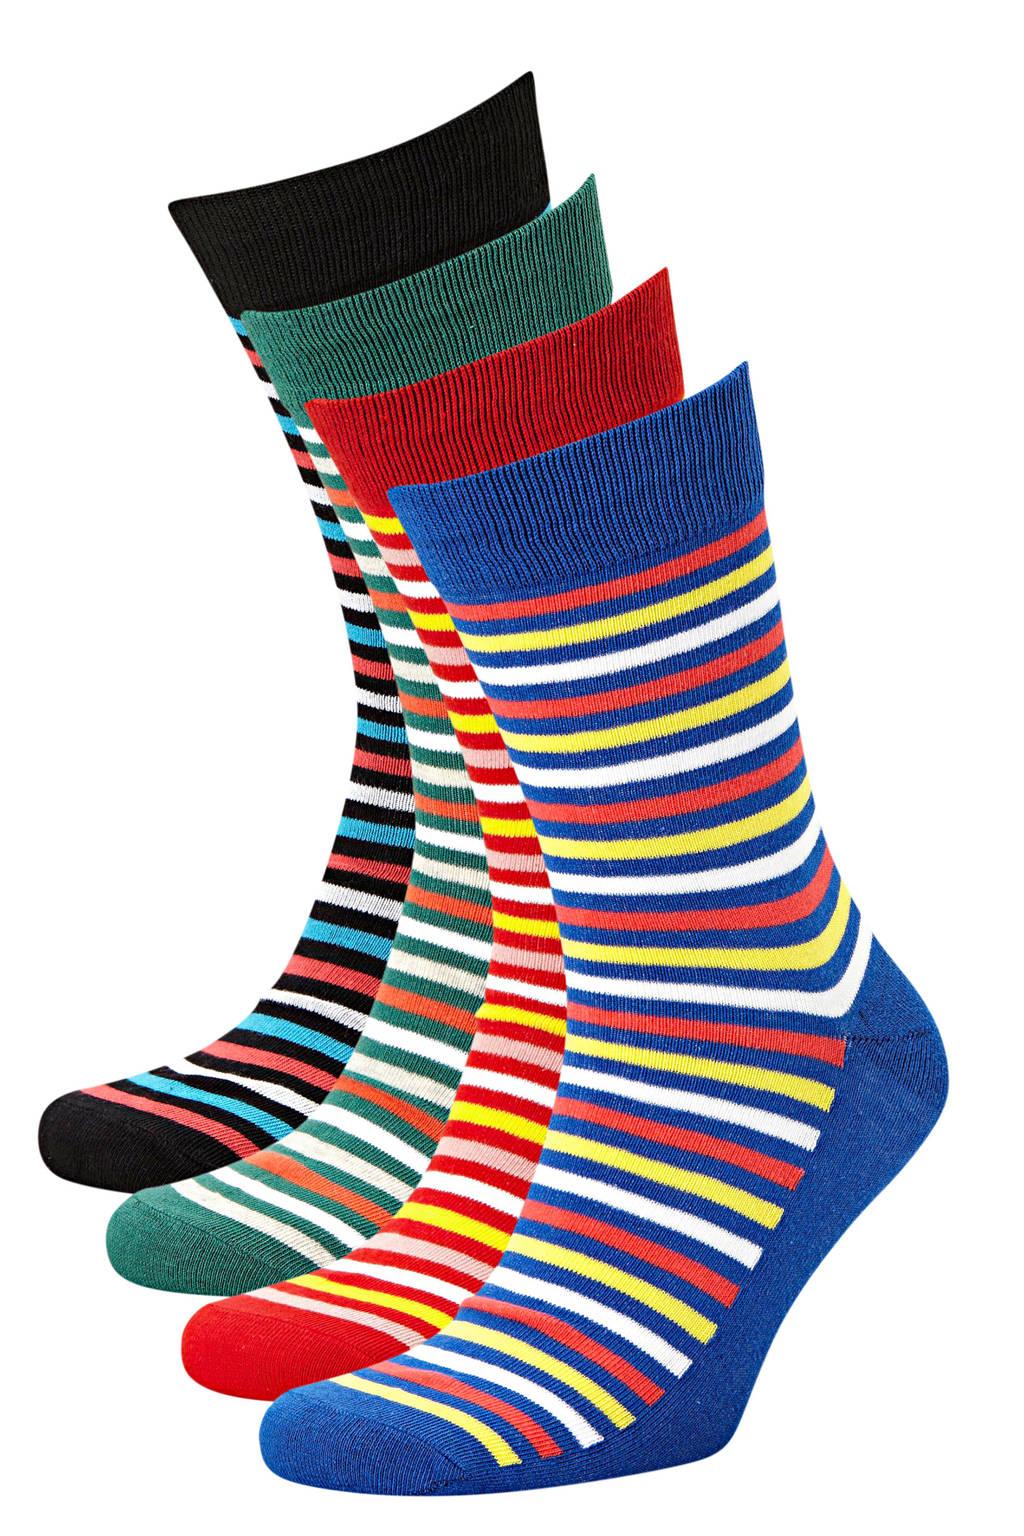 JACK & JONES sokken set van 4 paar multicolour, Multi